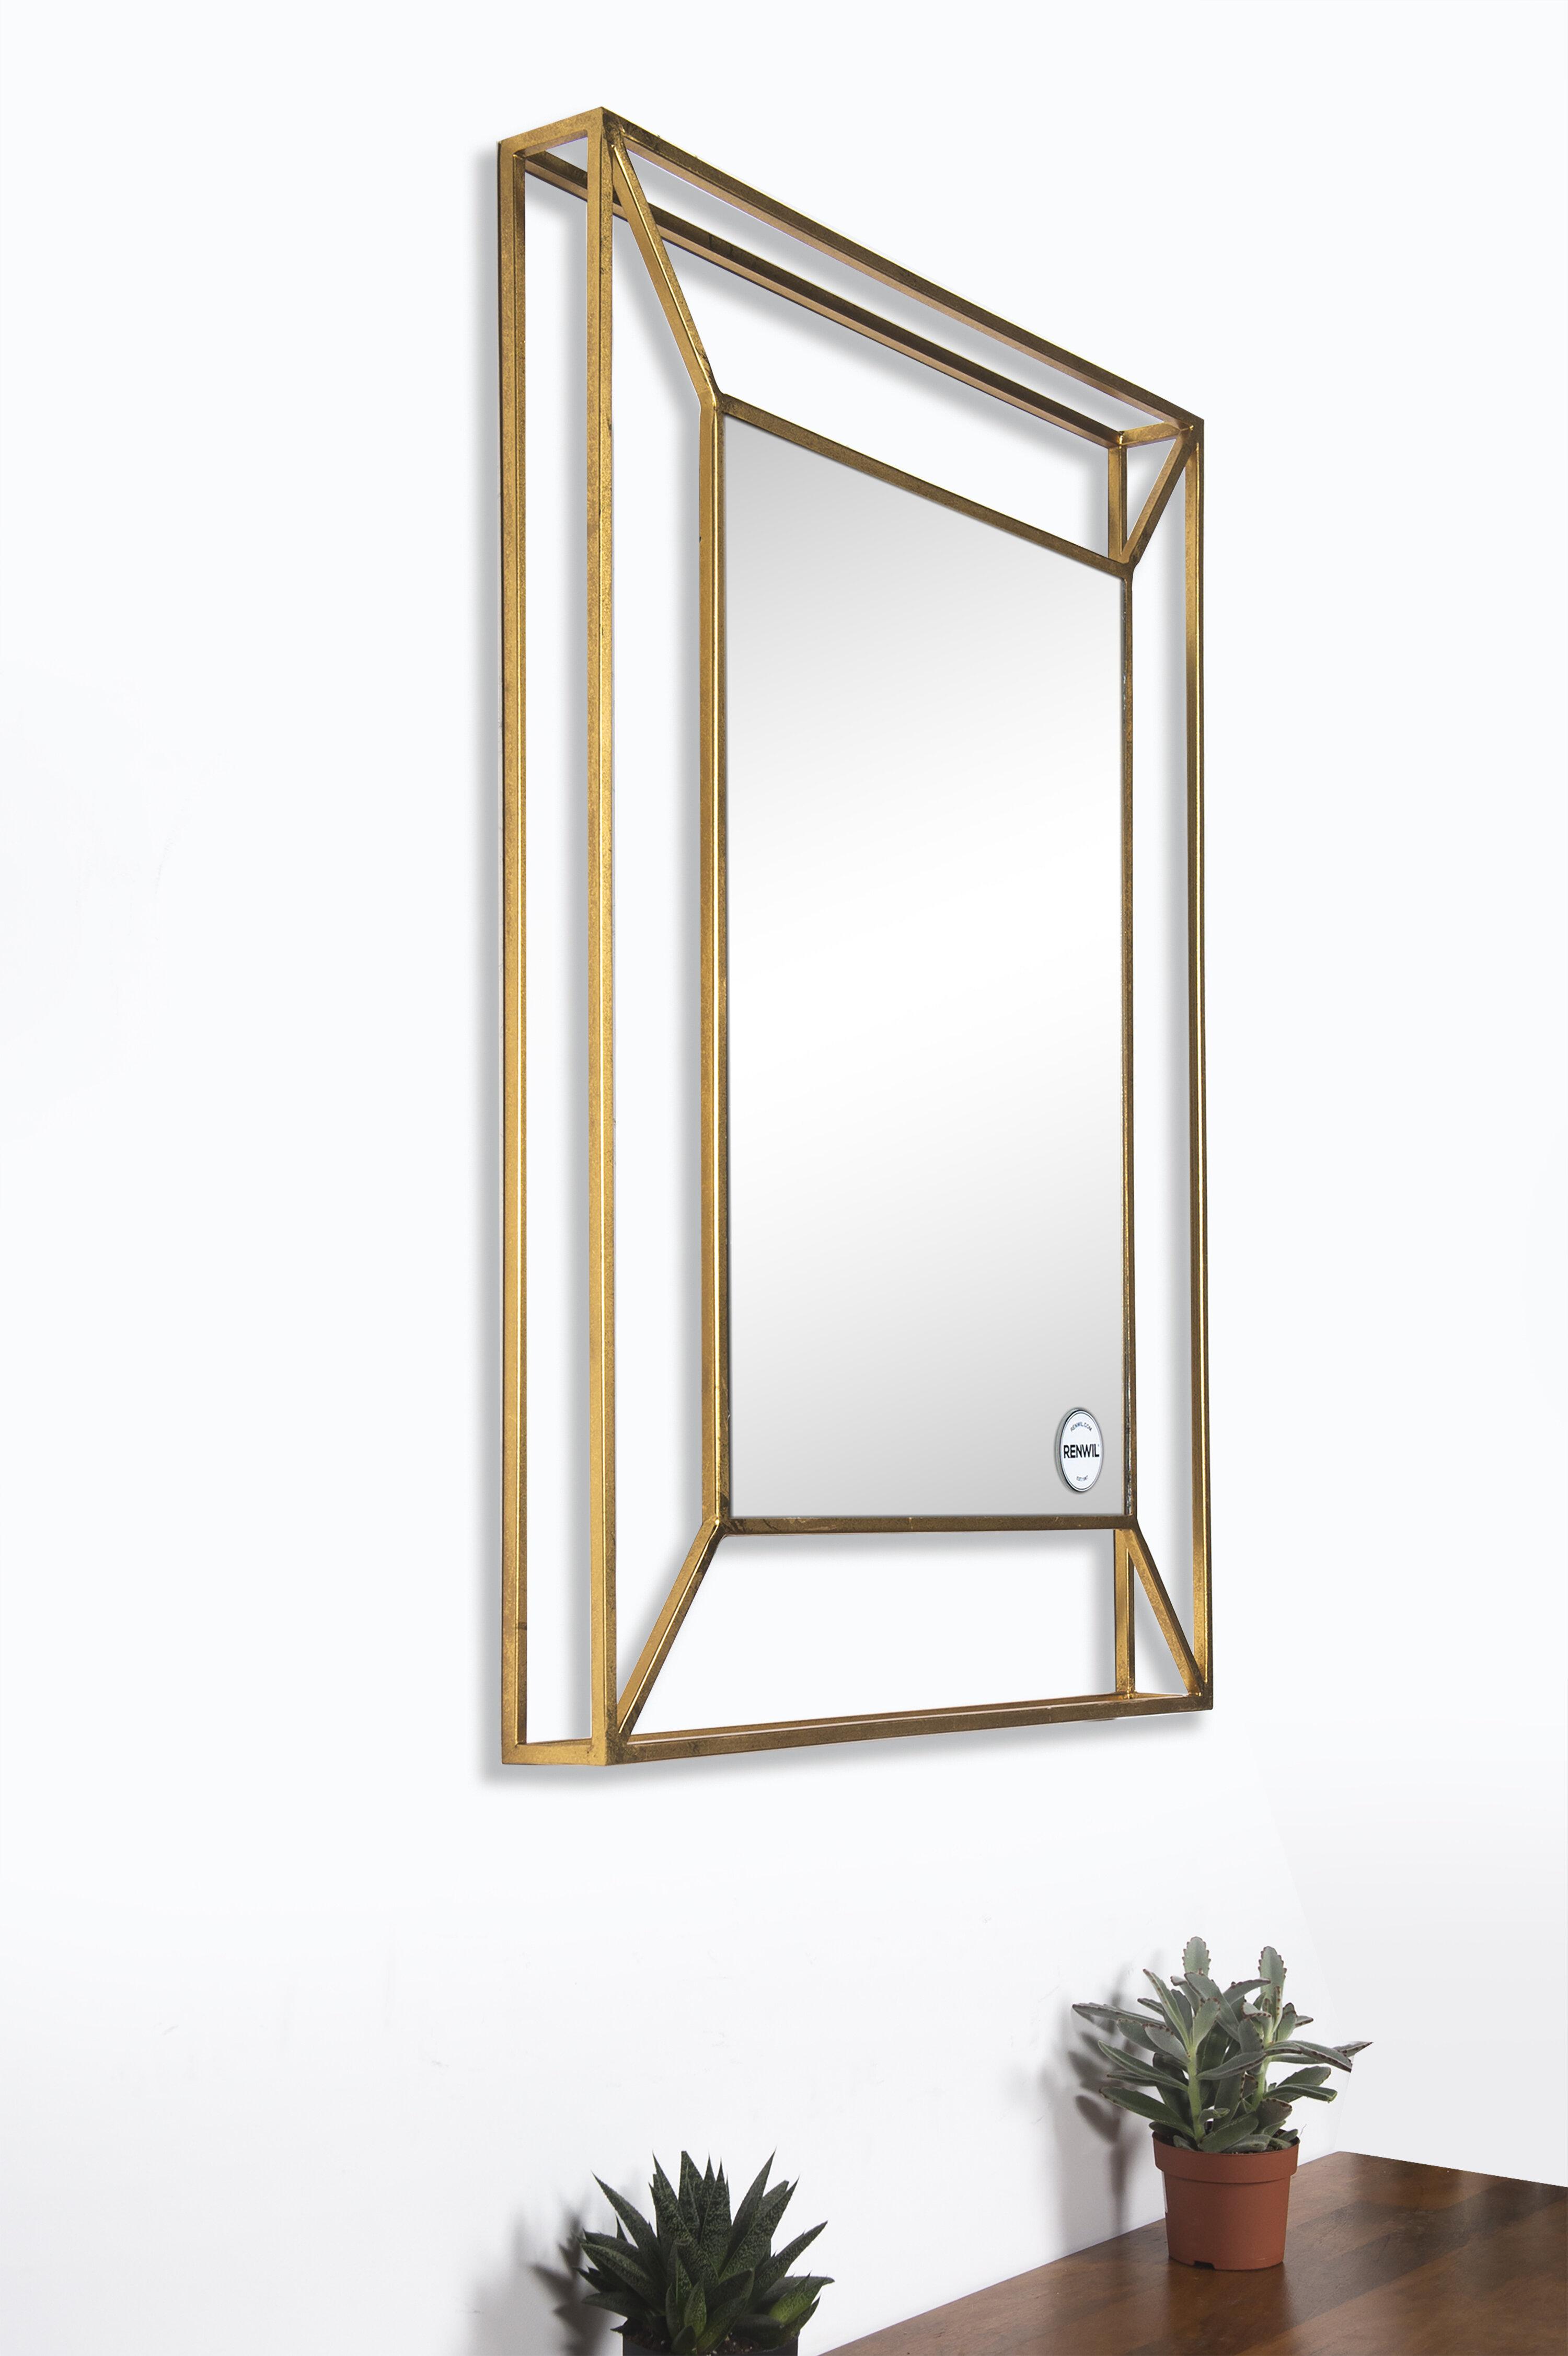 Mercer41 Lavigne Traditional Accent Mirror Reviews Wayfair